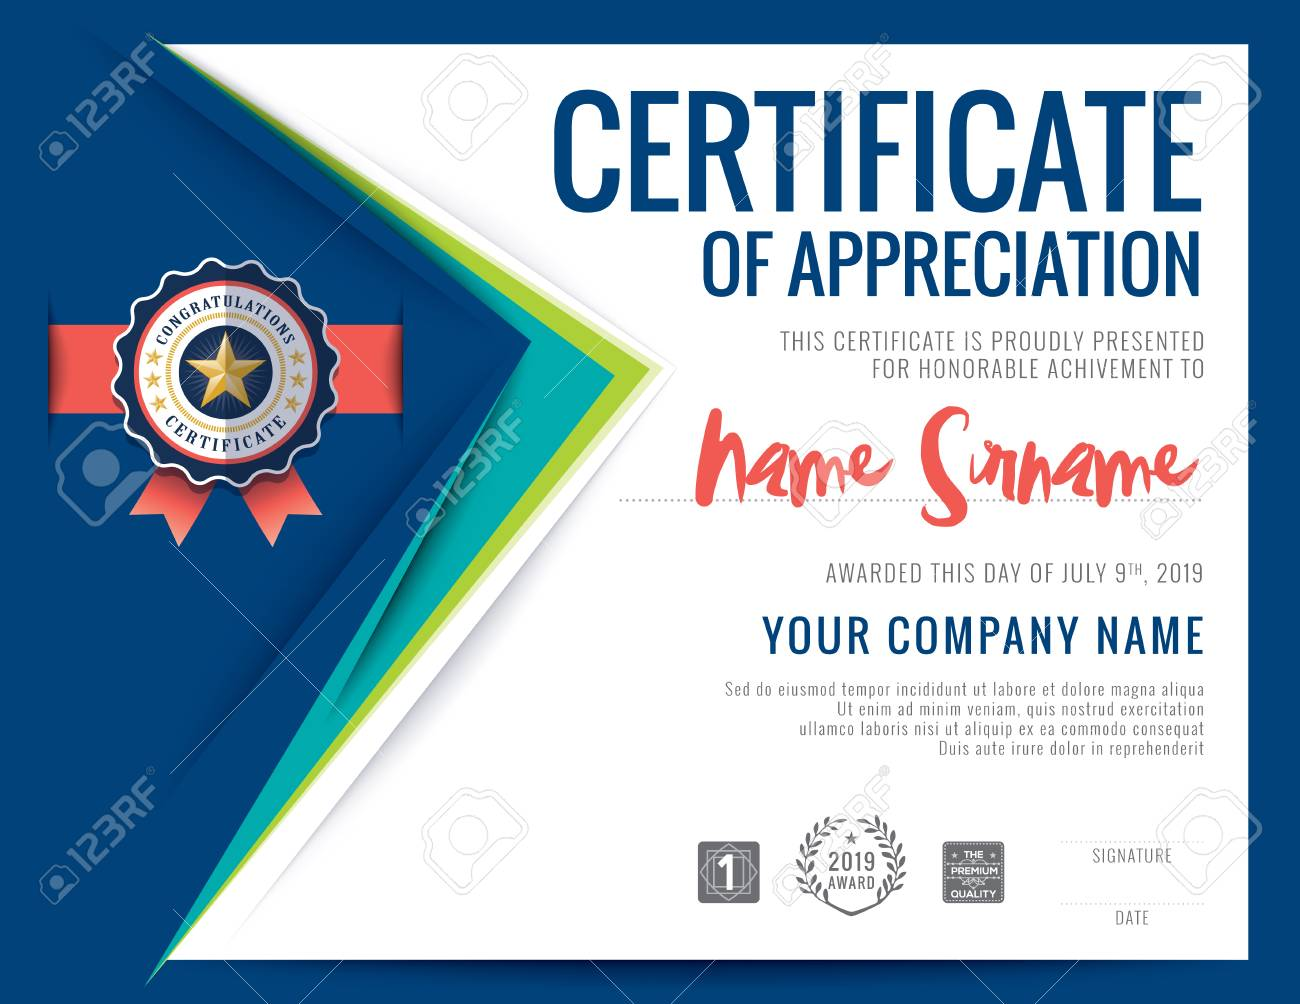 Modern certificate blue triangle shape background frame design modern certificate blue triangle shape background frame design template stock vector 55656562 yadclub Gallery